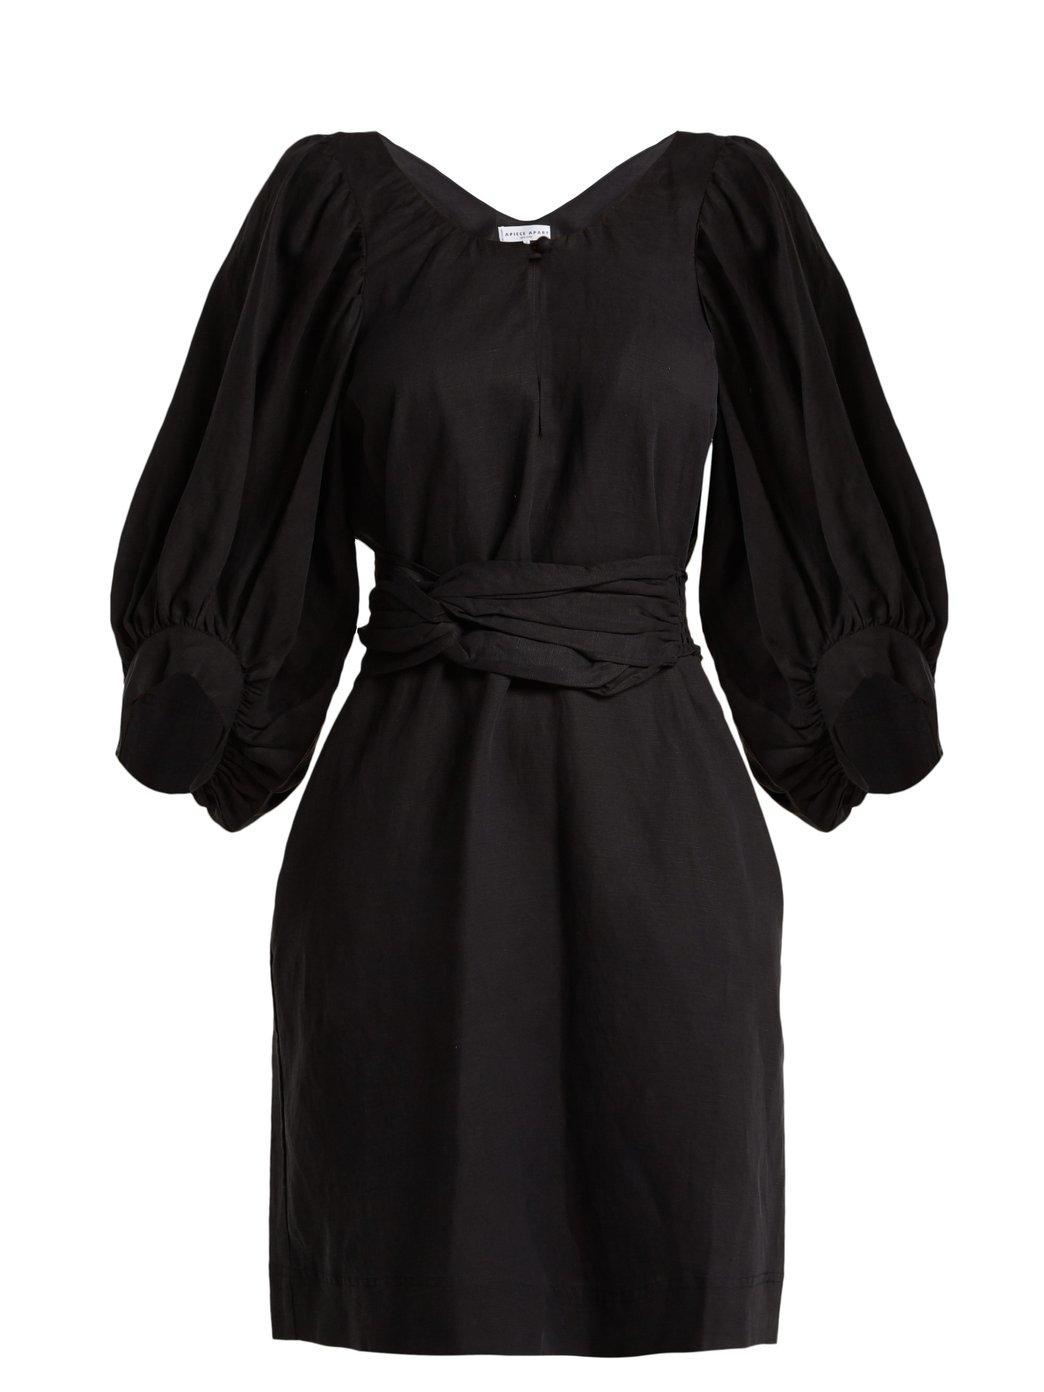 APEICE APART DRESS